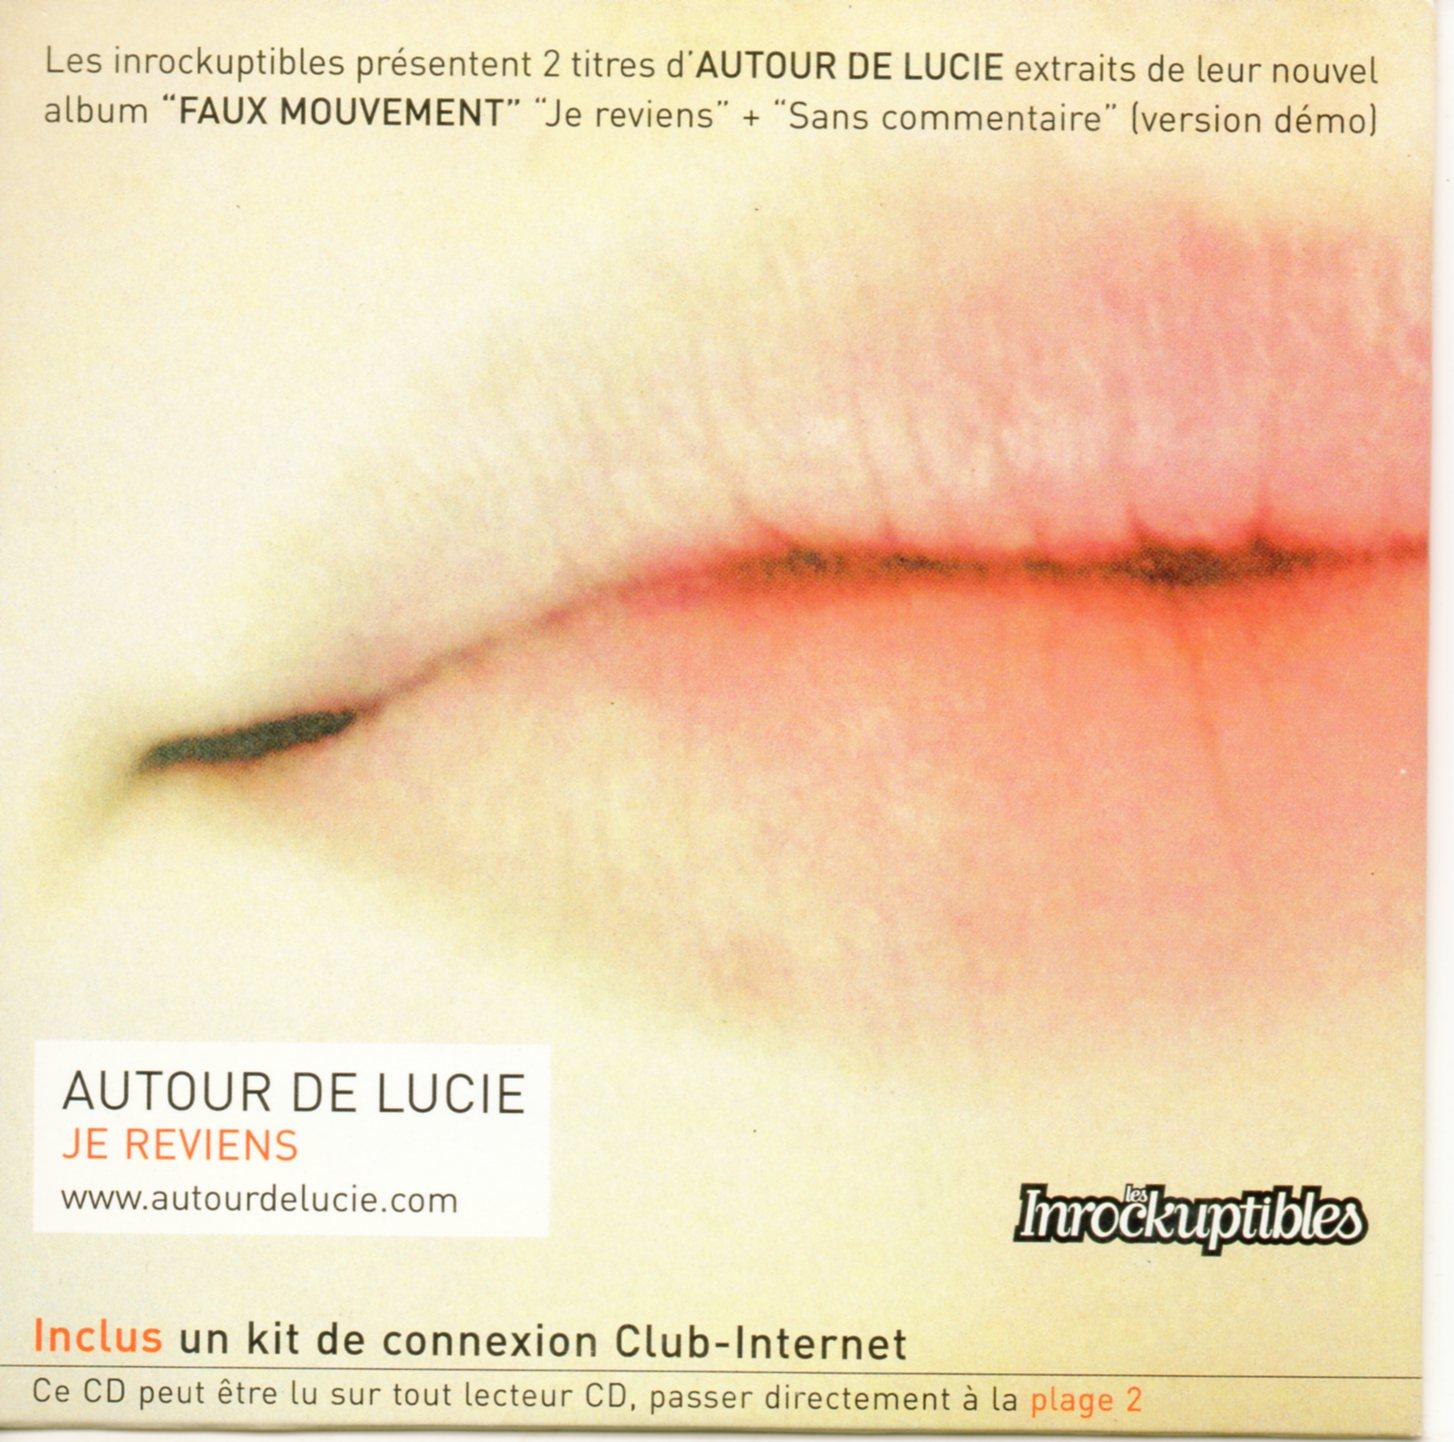 AUTOUR DE LUCIE - Je reviens Promo 2-track CARD SLEEVE - CD single